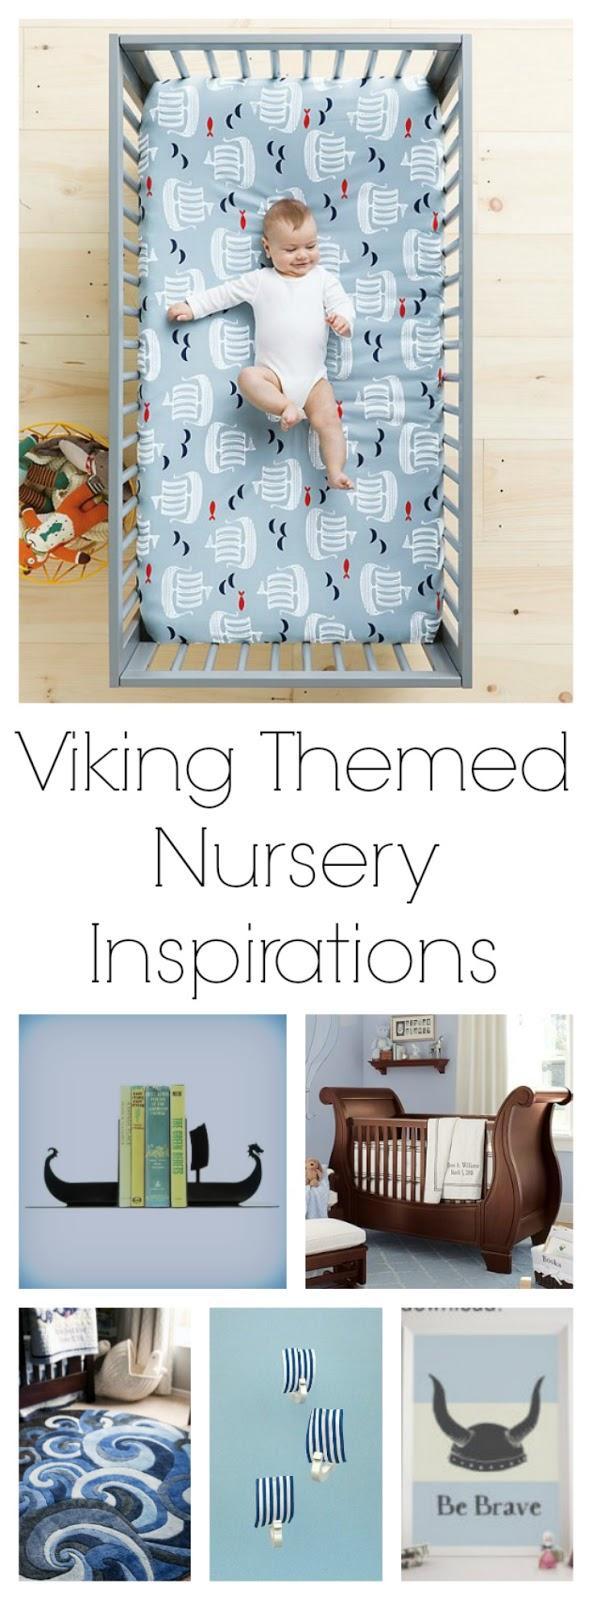 Viking Themed Nursery Ideas